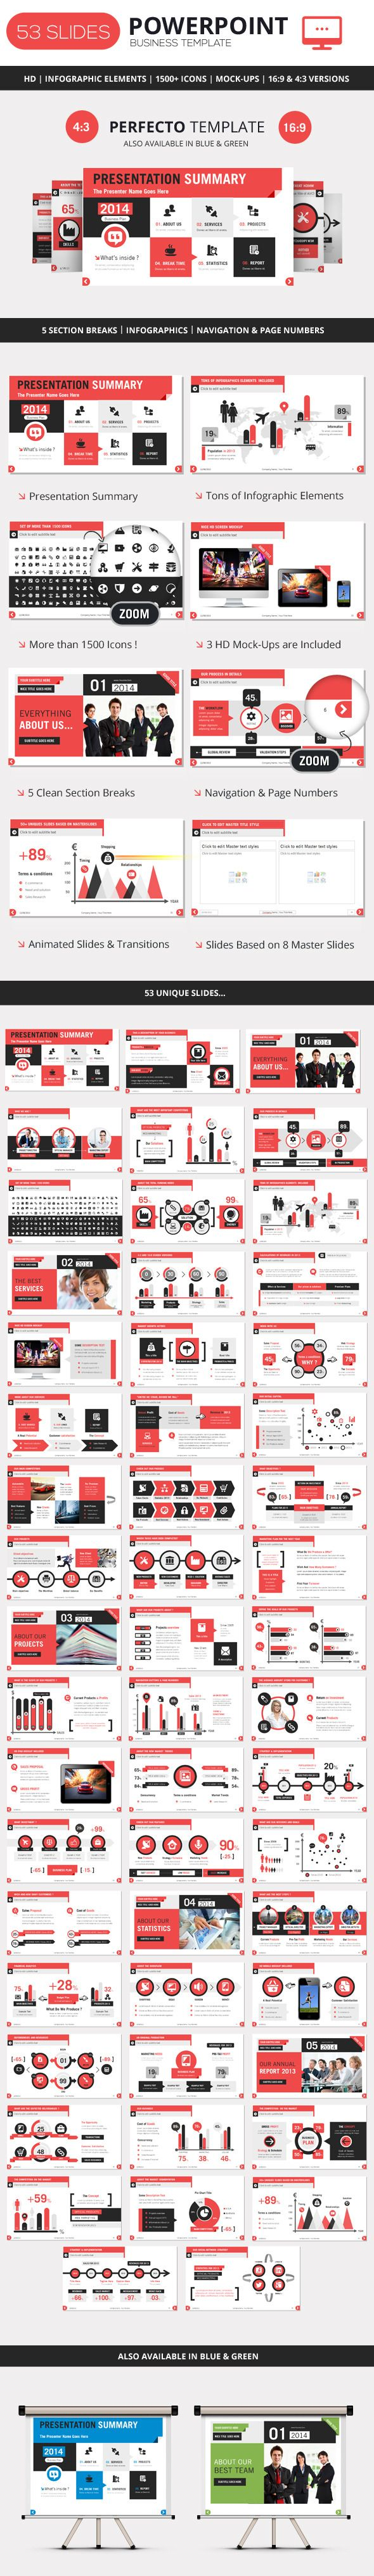 PowerPoint Business Presentation Template - Business PowerPoint Templates